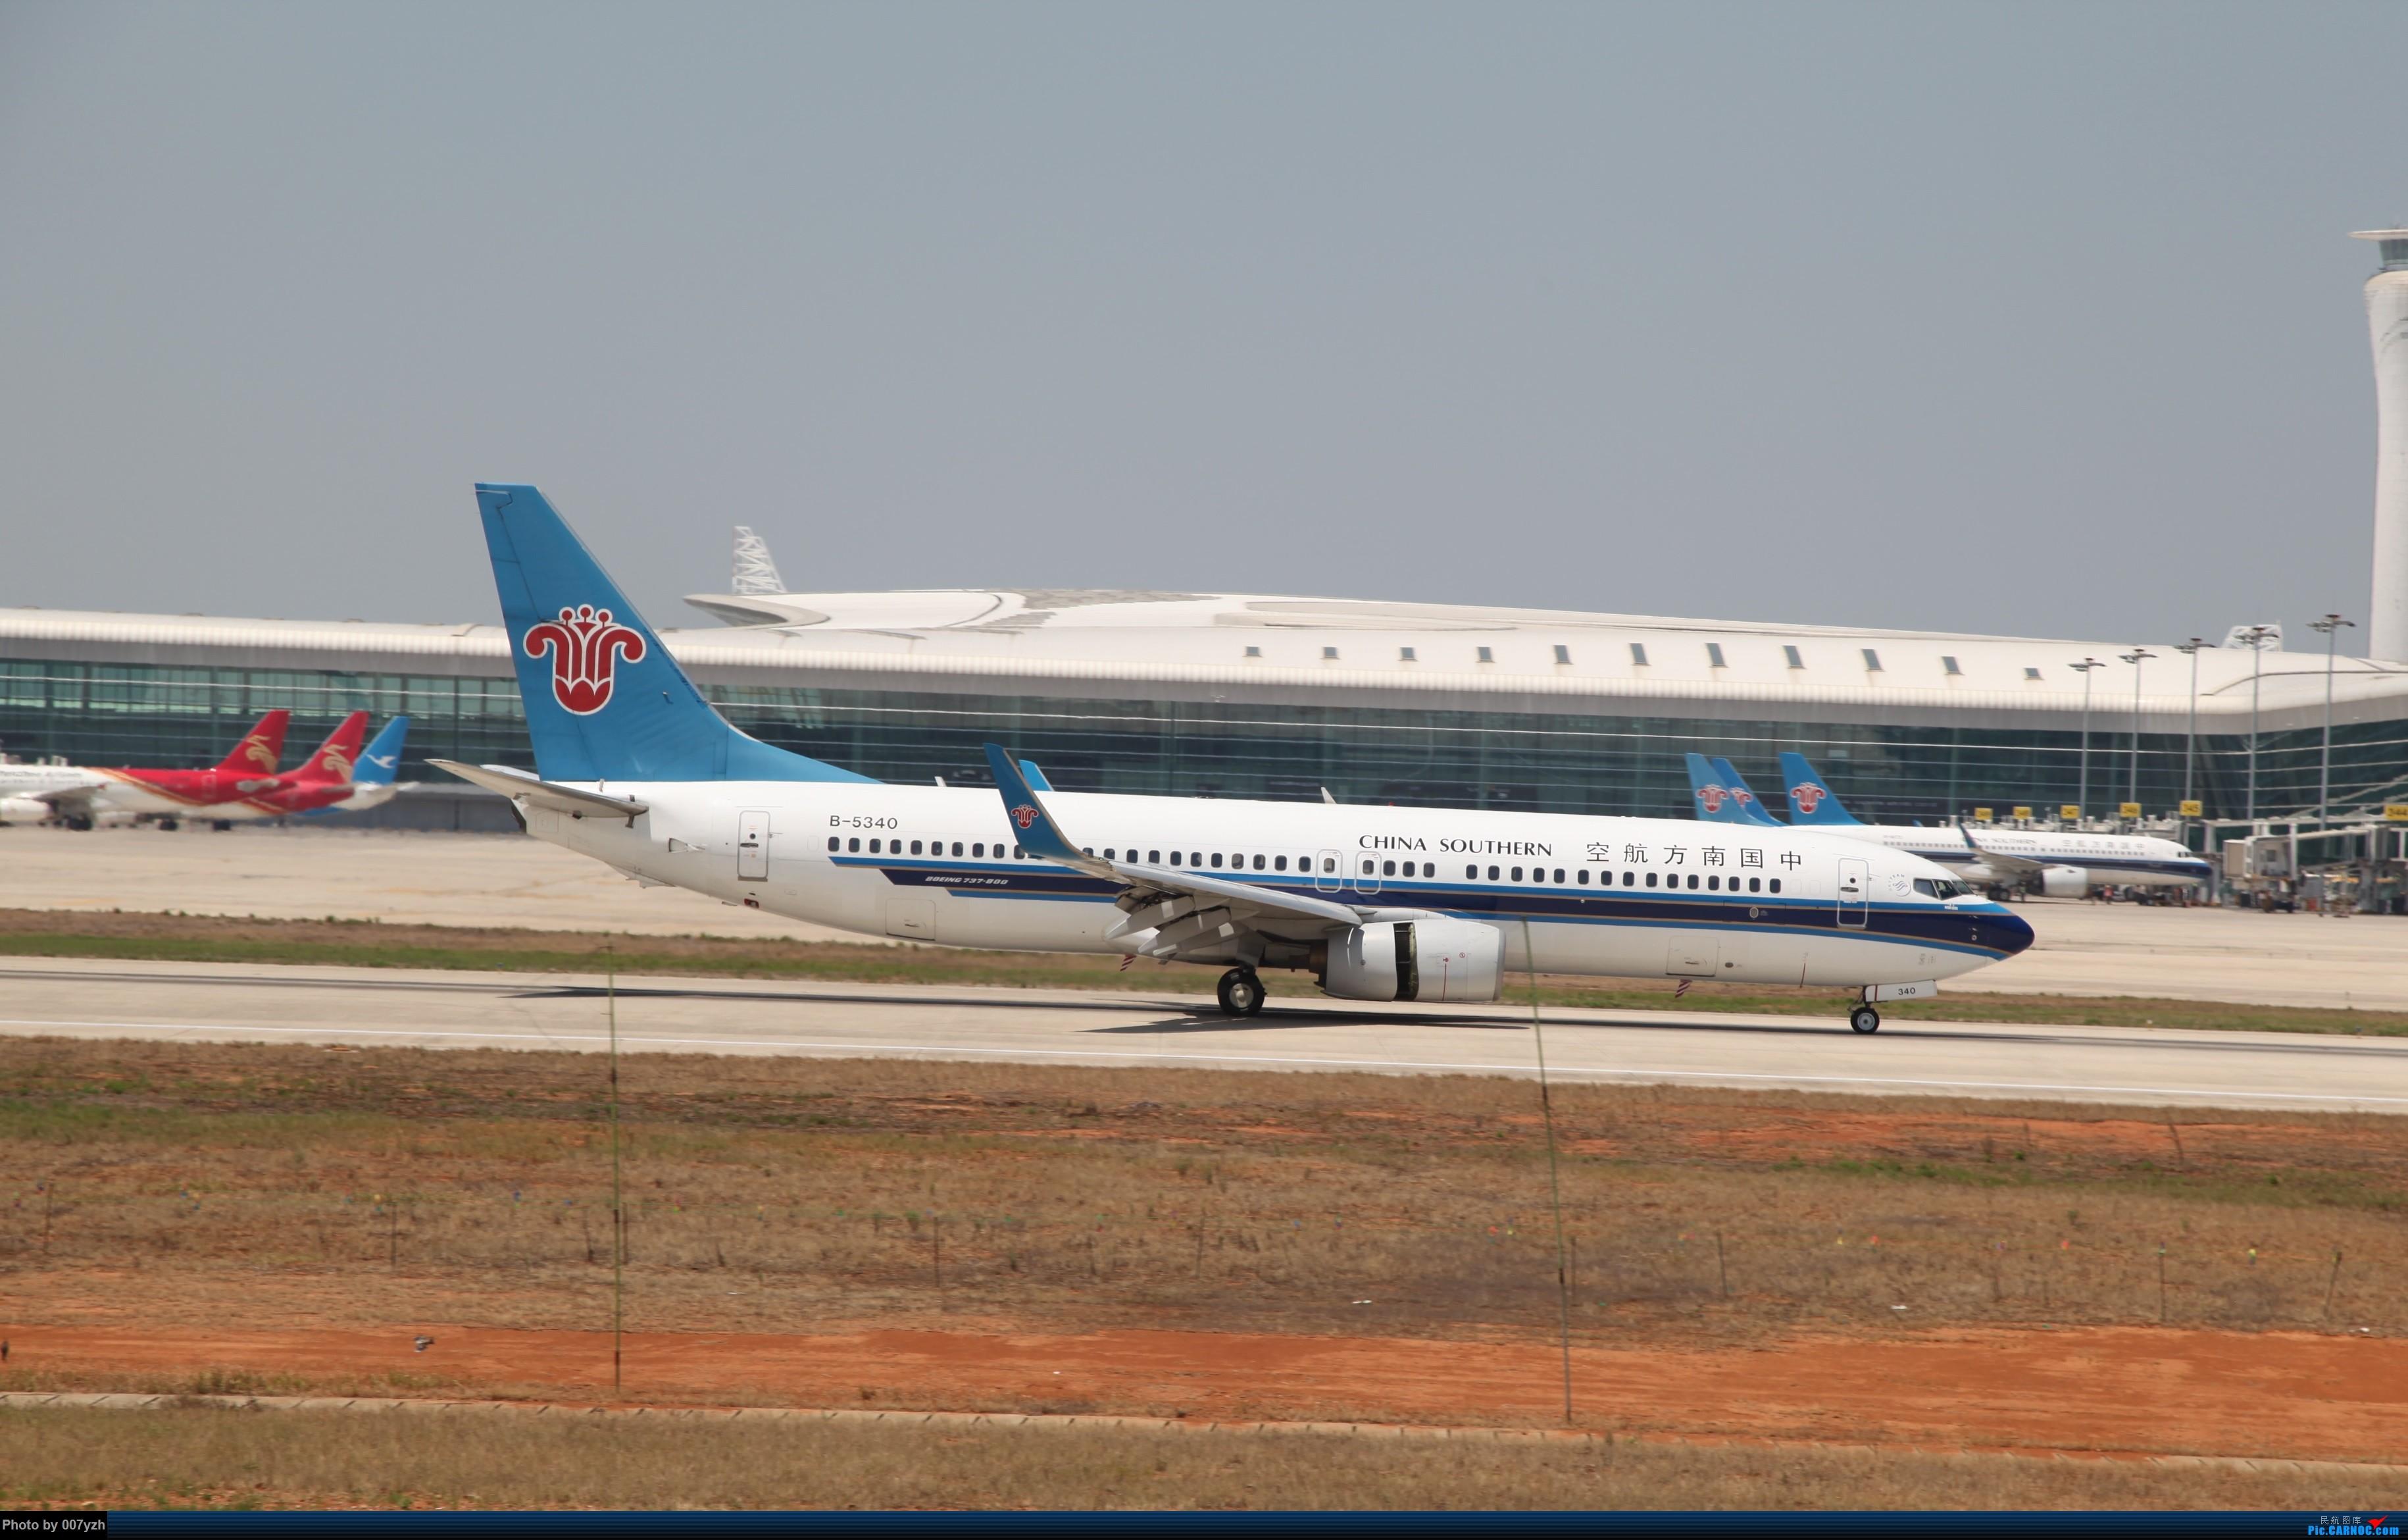 Re:[原创]奔着南航789来的武汉04R跑道拍机 BOEING 737-800 B-5340 中国武汉天河国际机场